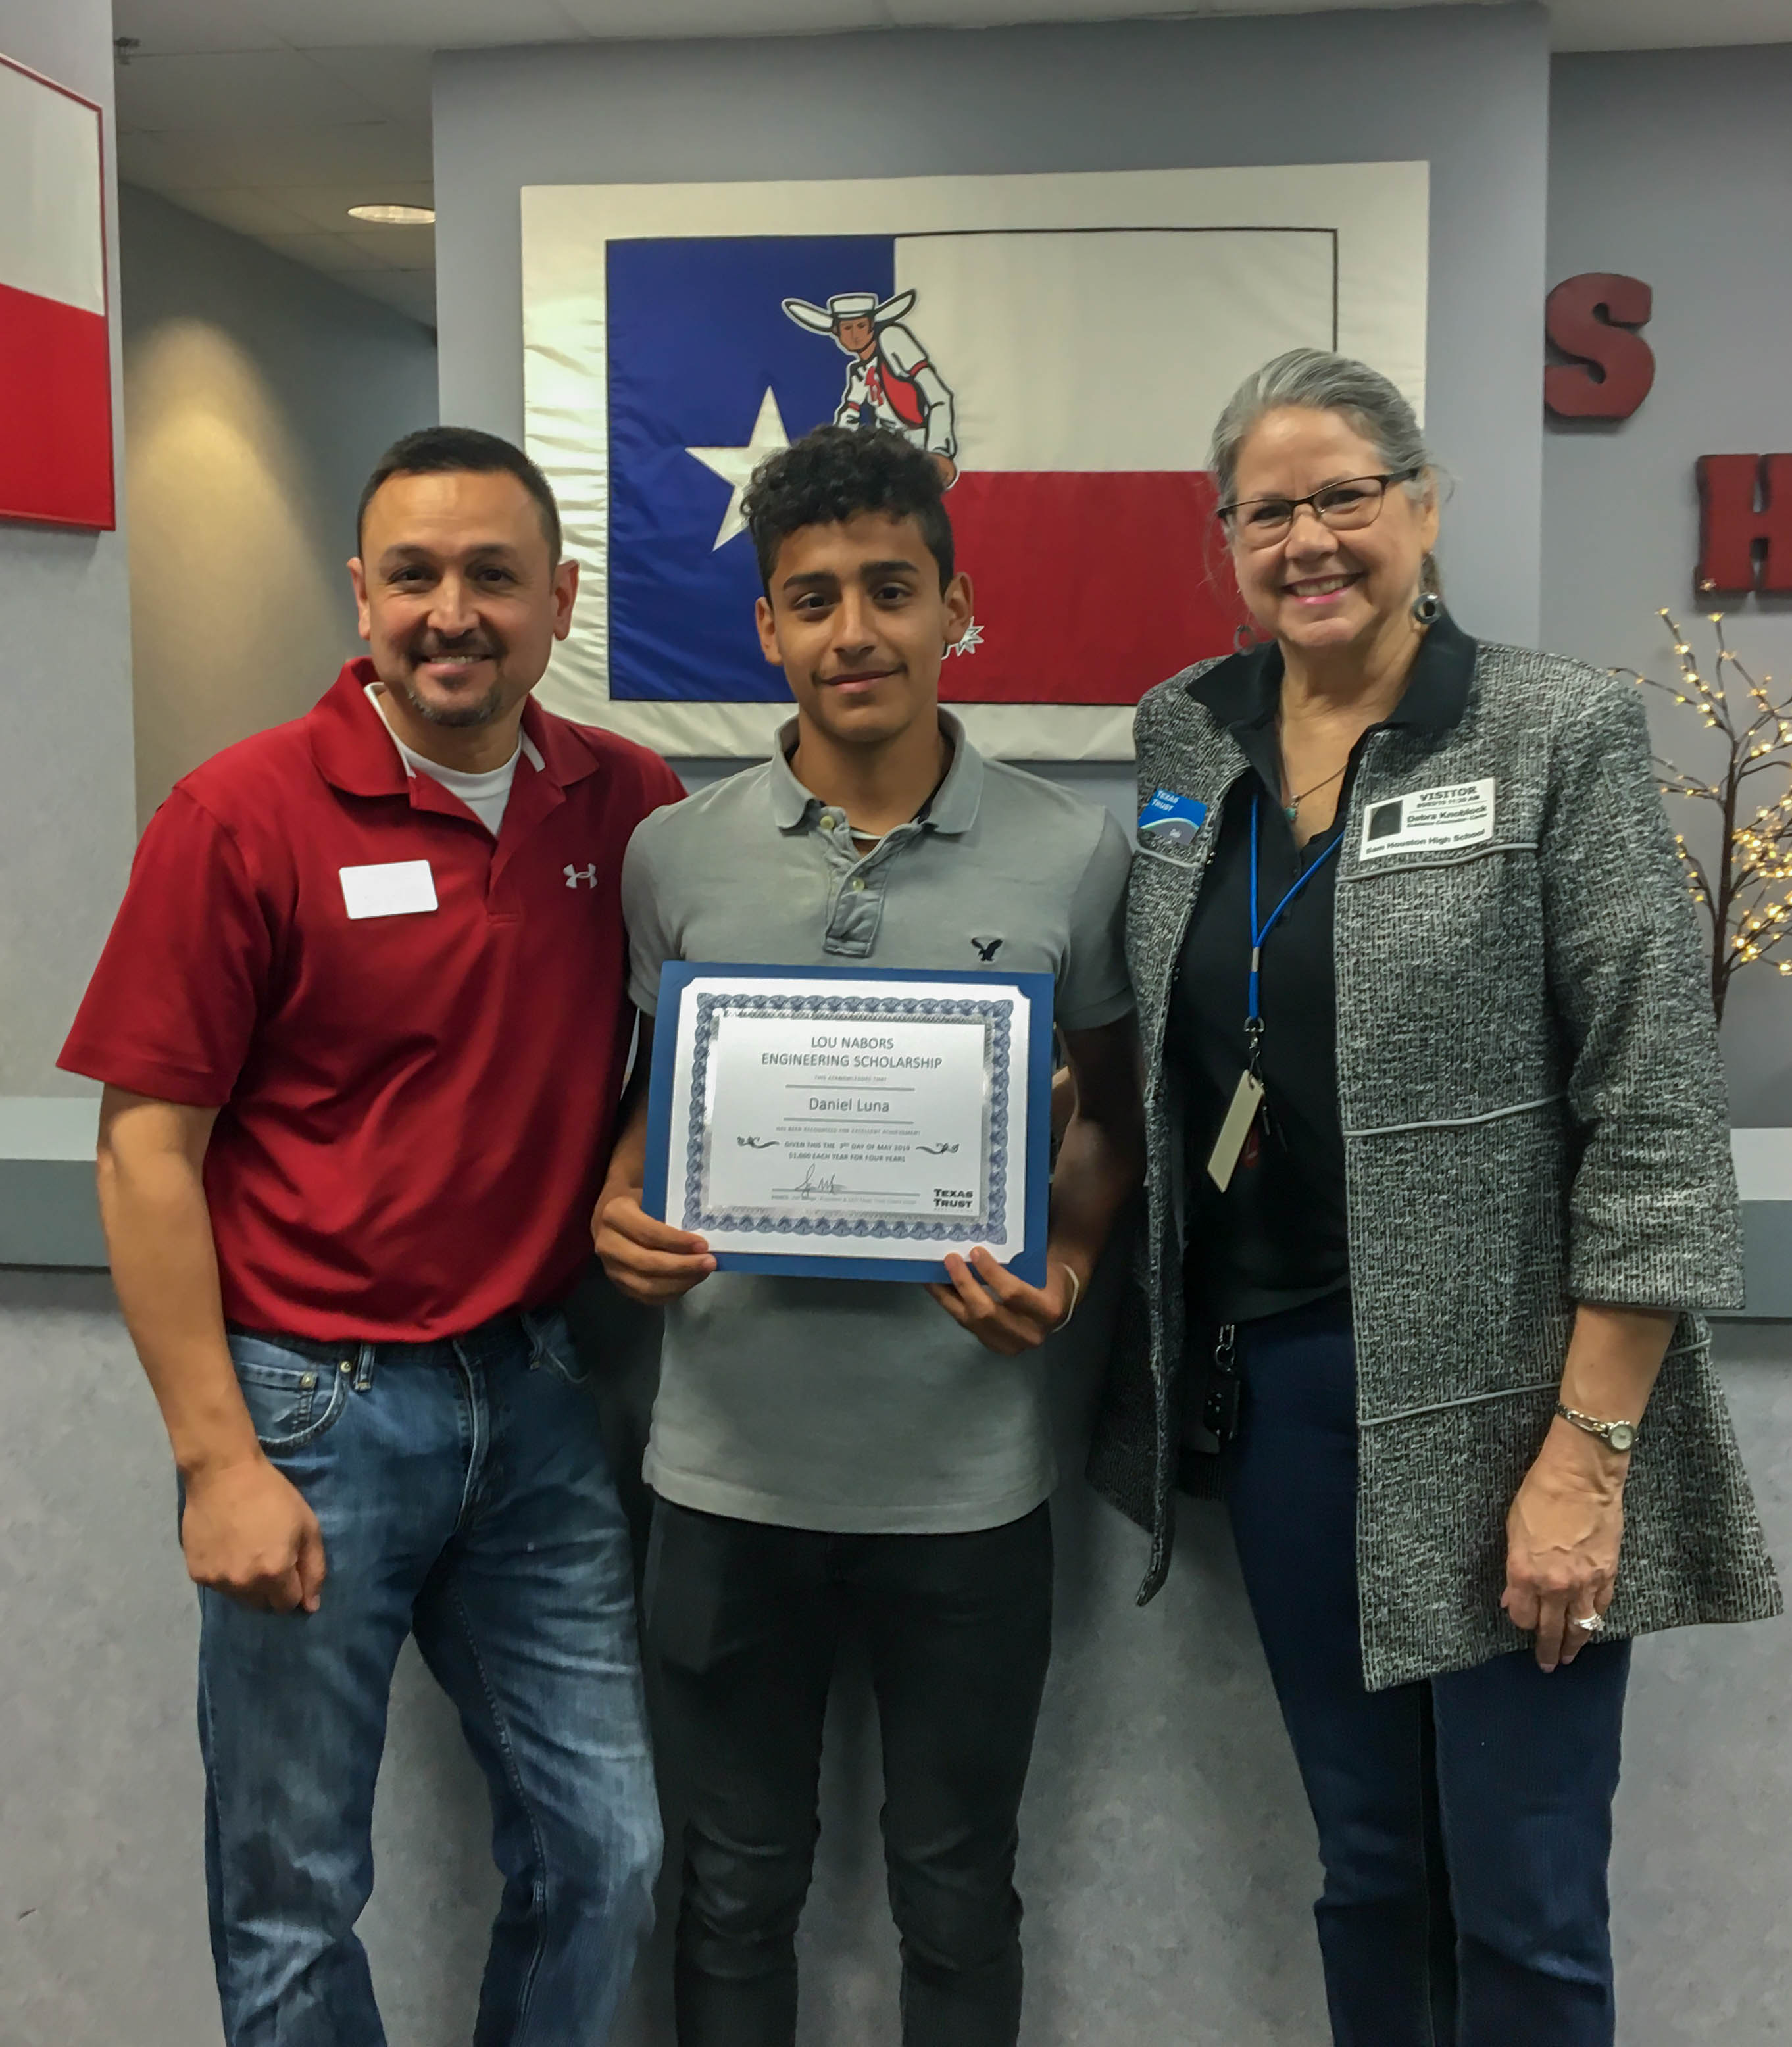 Daniel Luna Principal Benavides and Texas Trust Credit Union's AVP of Business & Community Engagement Debi Knoblock